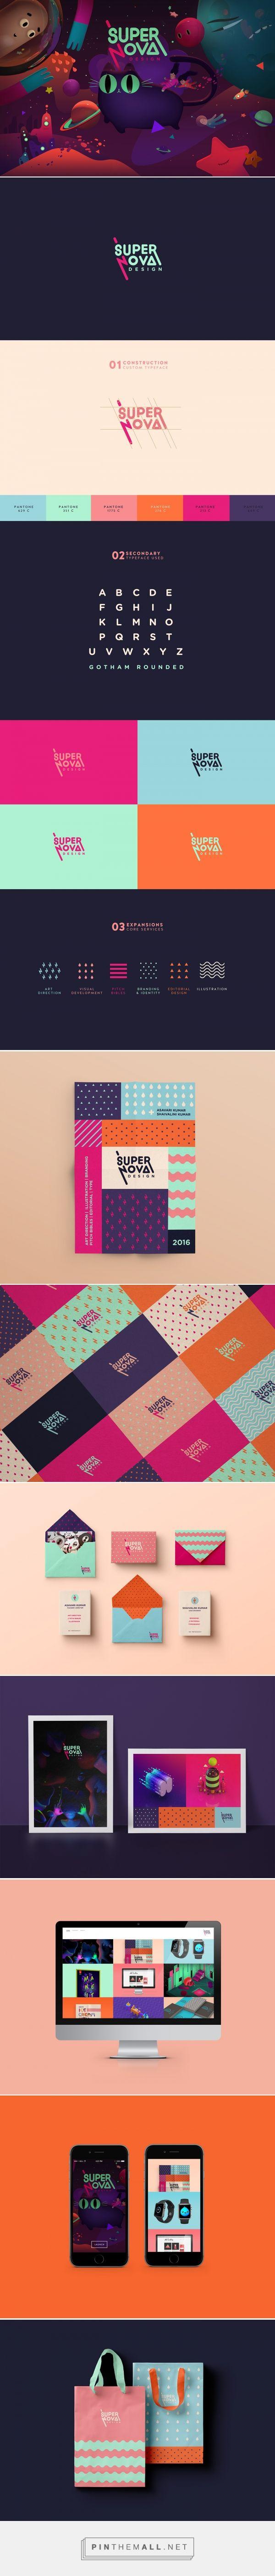 Supernova Design Branding on Behance | Fivestar Branding – Design and Branding Agency & Inspiration Gallery Más